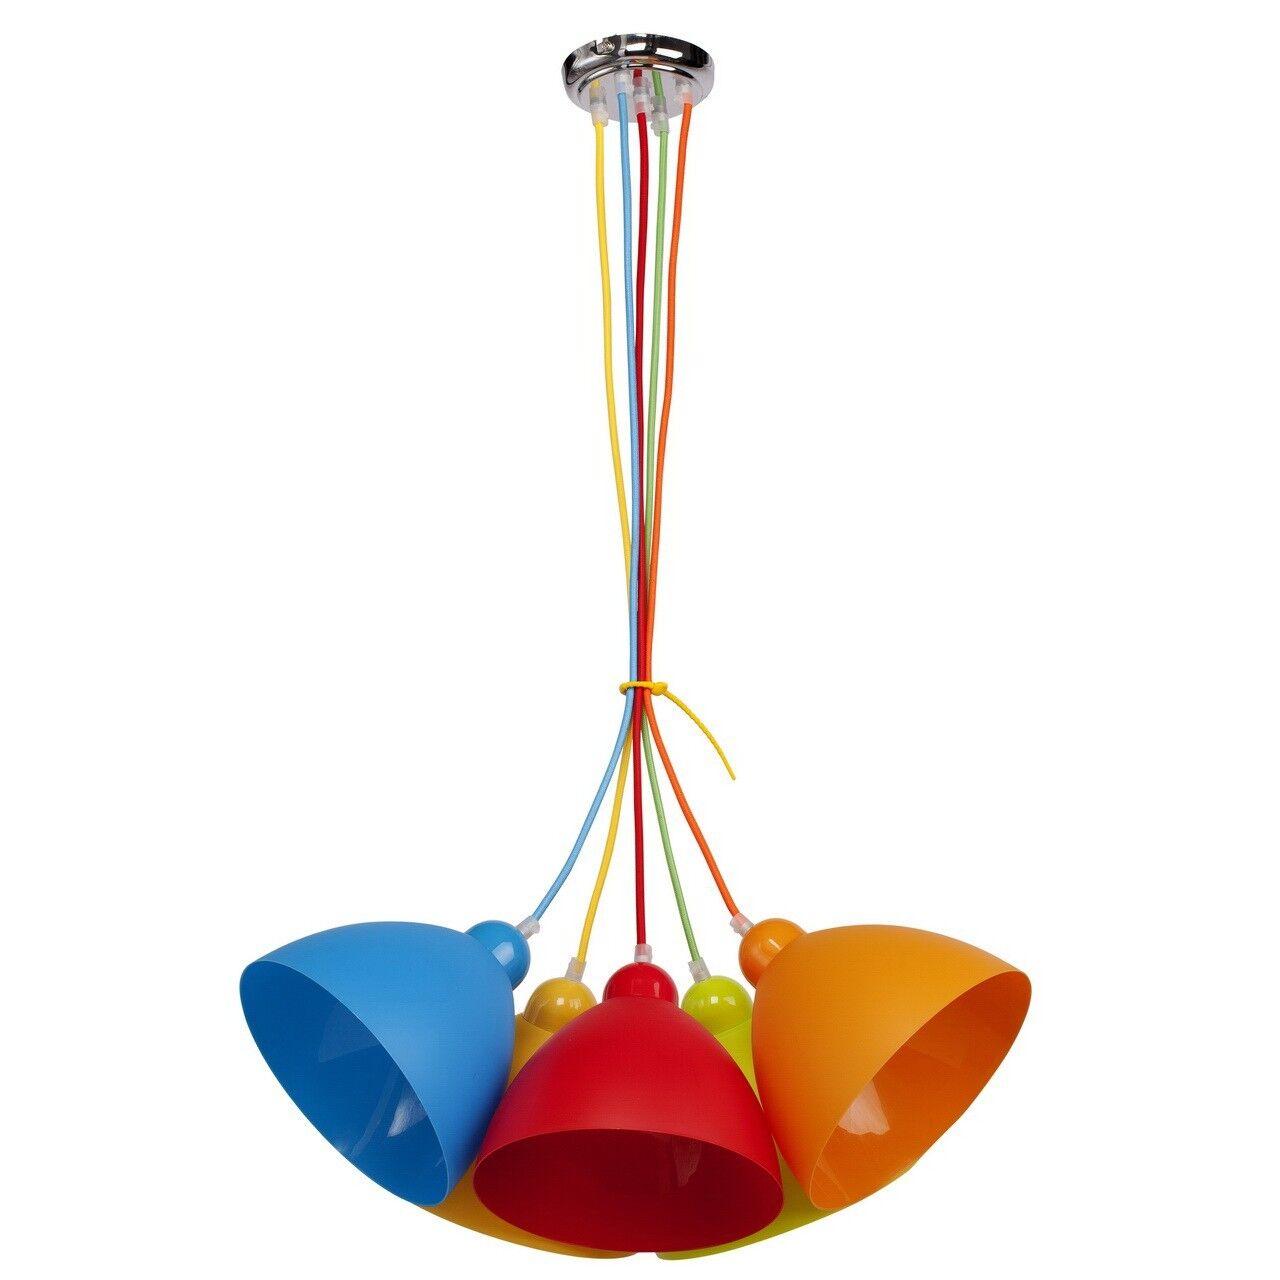 Farbeful pendant ceiling light kids room multicolour acrylic metal 540W E27